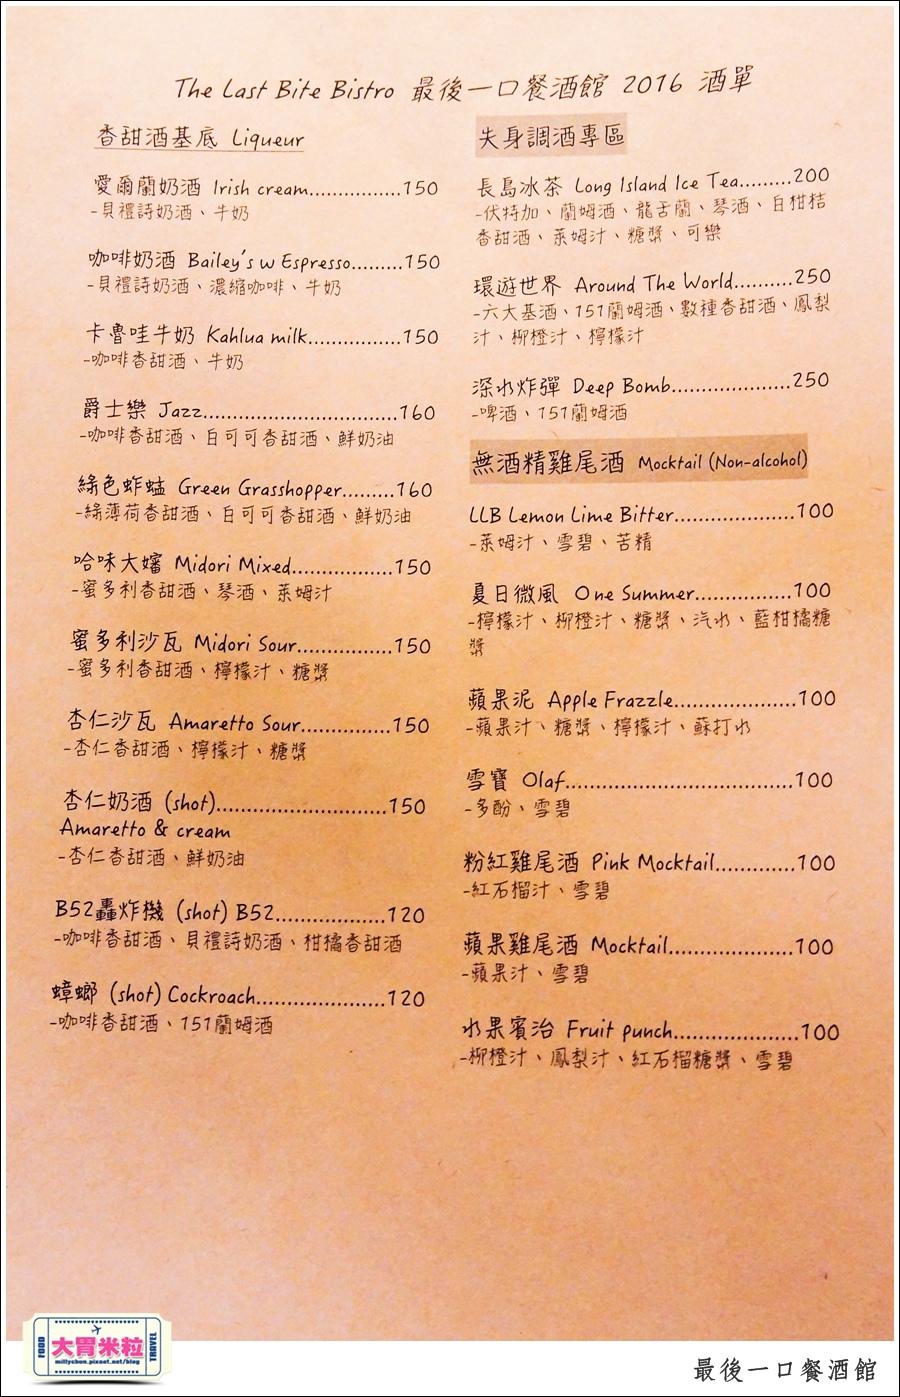 The Last Bite Bistro 最後一口餐酒館@高雄餐酒館推薦@大胃米粒0017.jpg